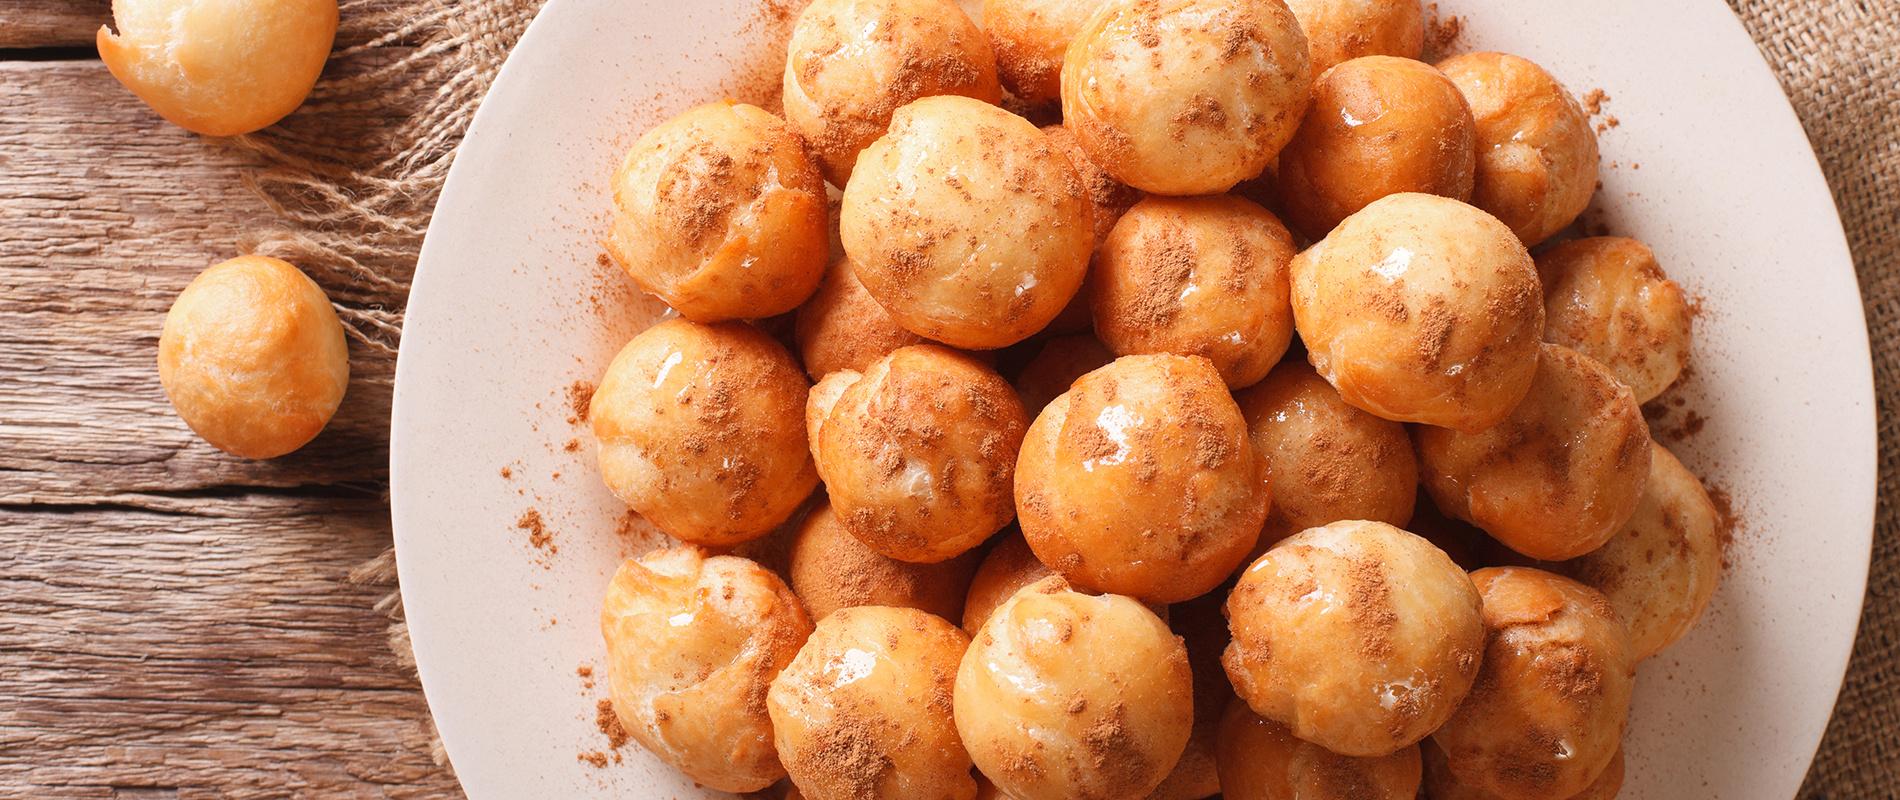 krumplifánkcover